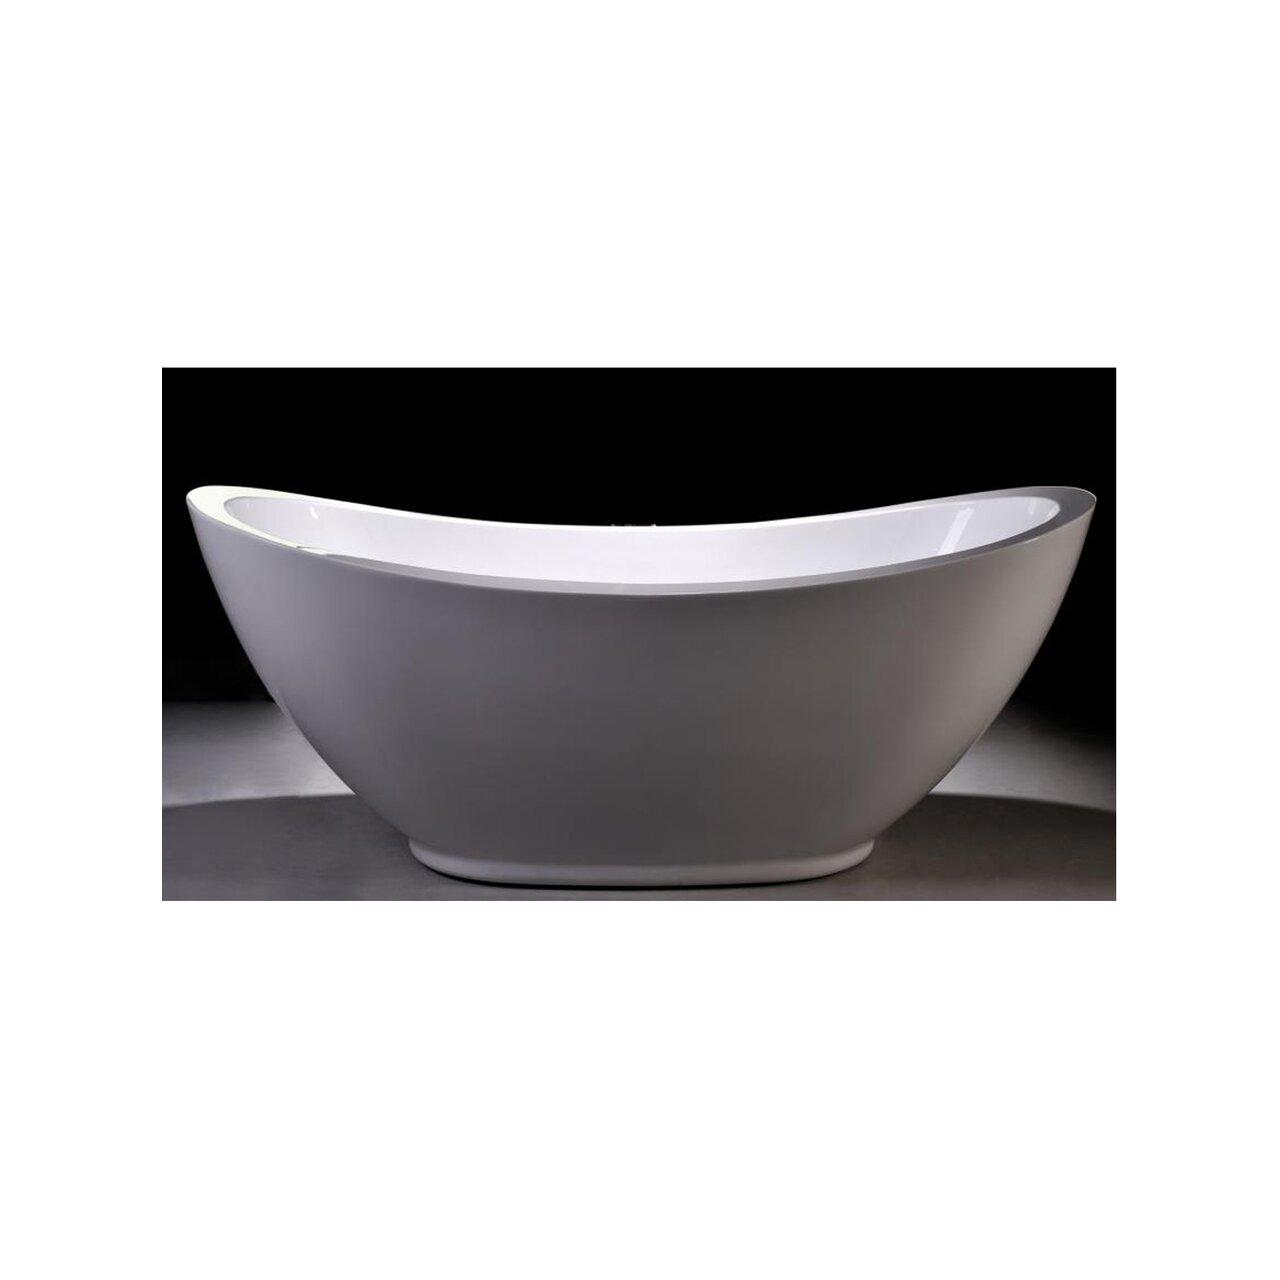 "MTDVanities Seal 69"" X 33.5"" Soaking Bathtub & Reviews"